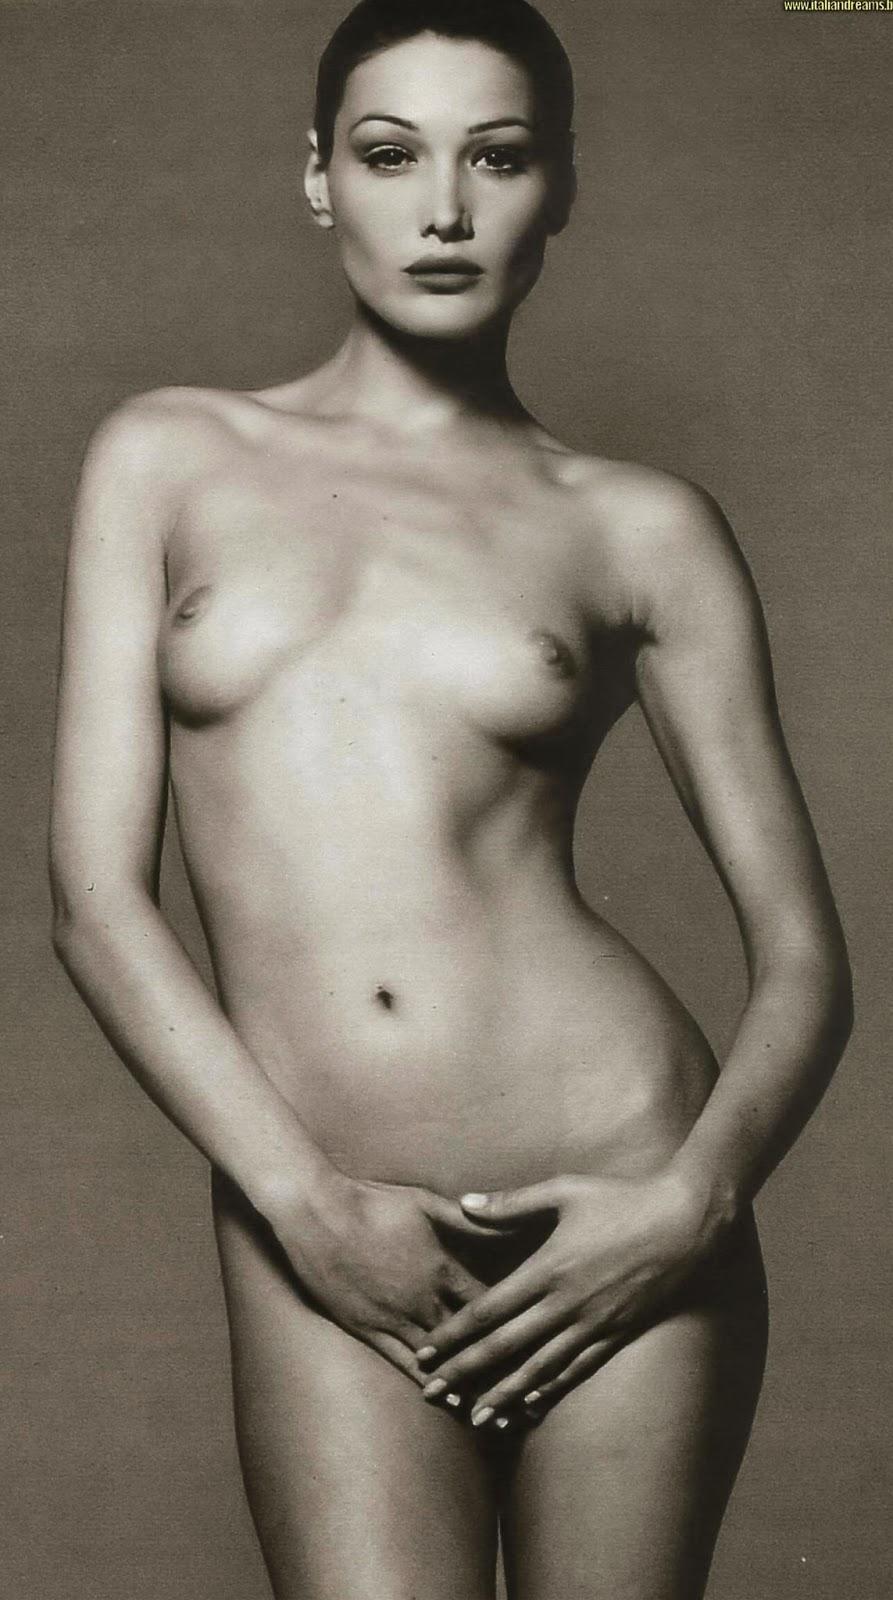 Celebrity nude models - 2019 year